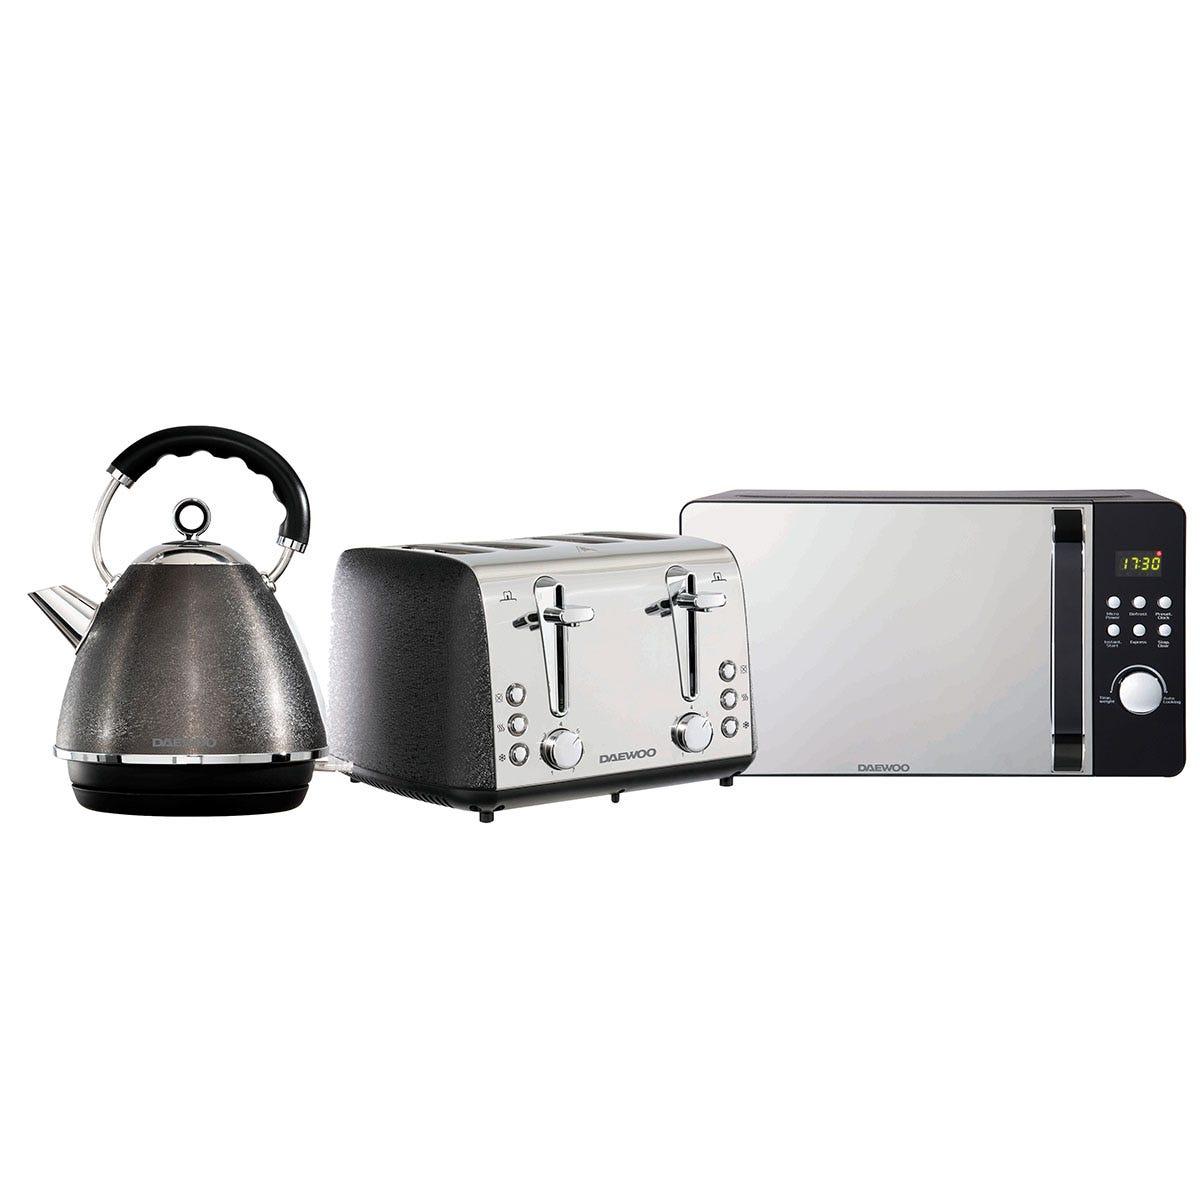 Daewoo SDA2423DS Glace Noir 1.7L Pyramid Kettle, 4-Slice Toaster, and 20L Digital Microwave Bundle - Black